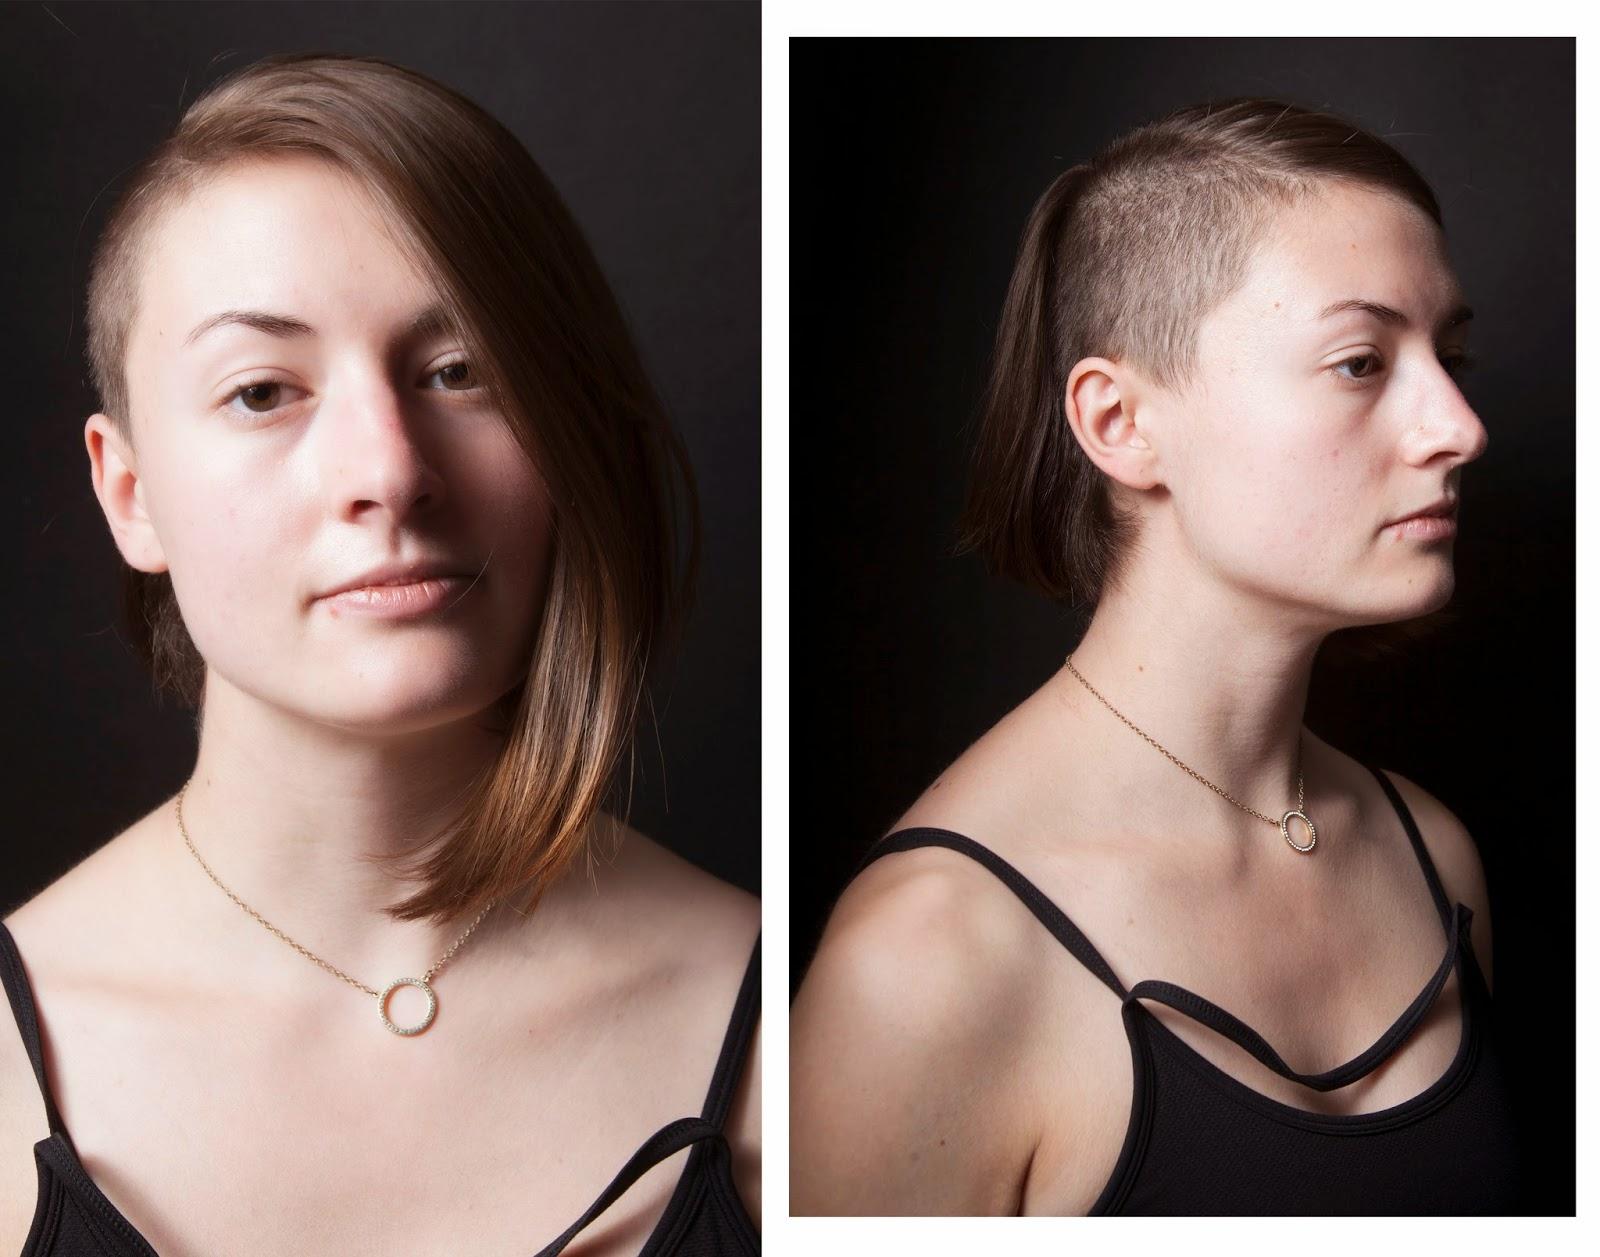 cameltoe Young Brianna Stone naked photo 2017